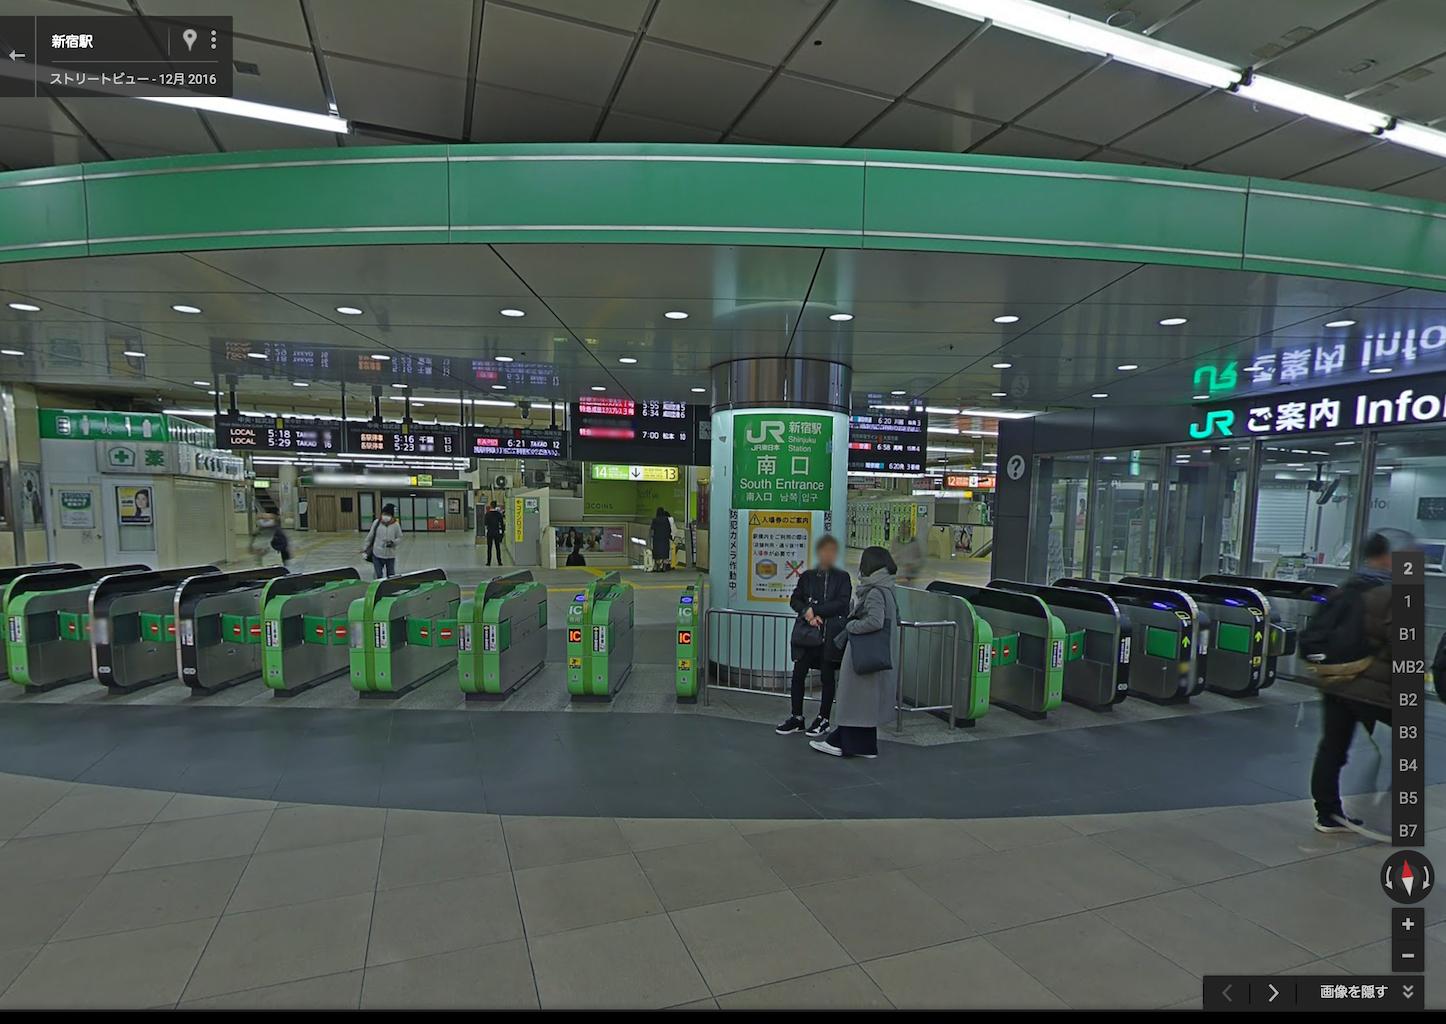 Shinjuku Google Street View